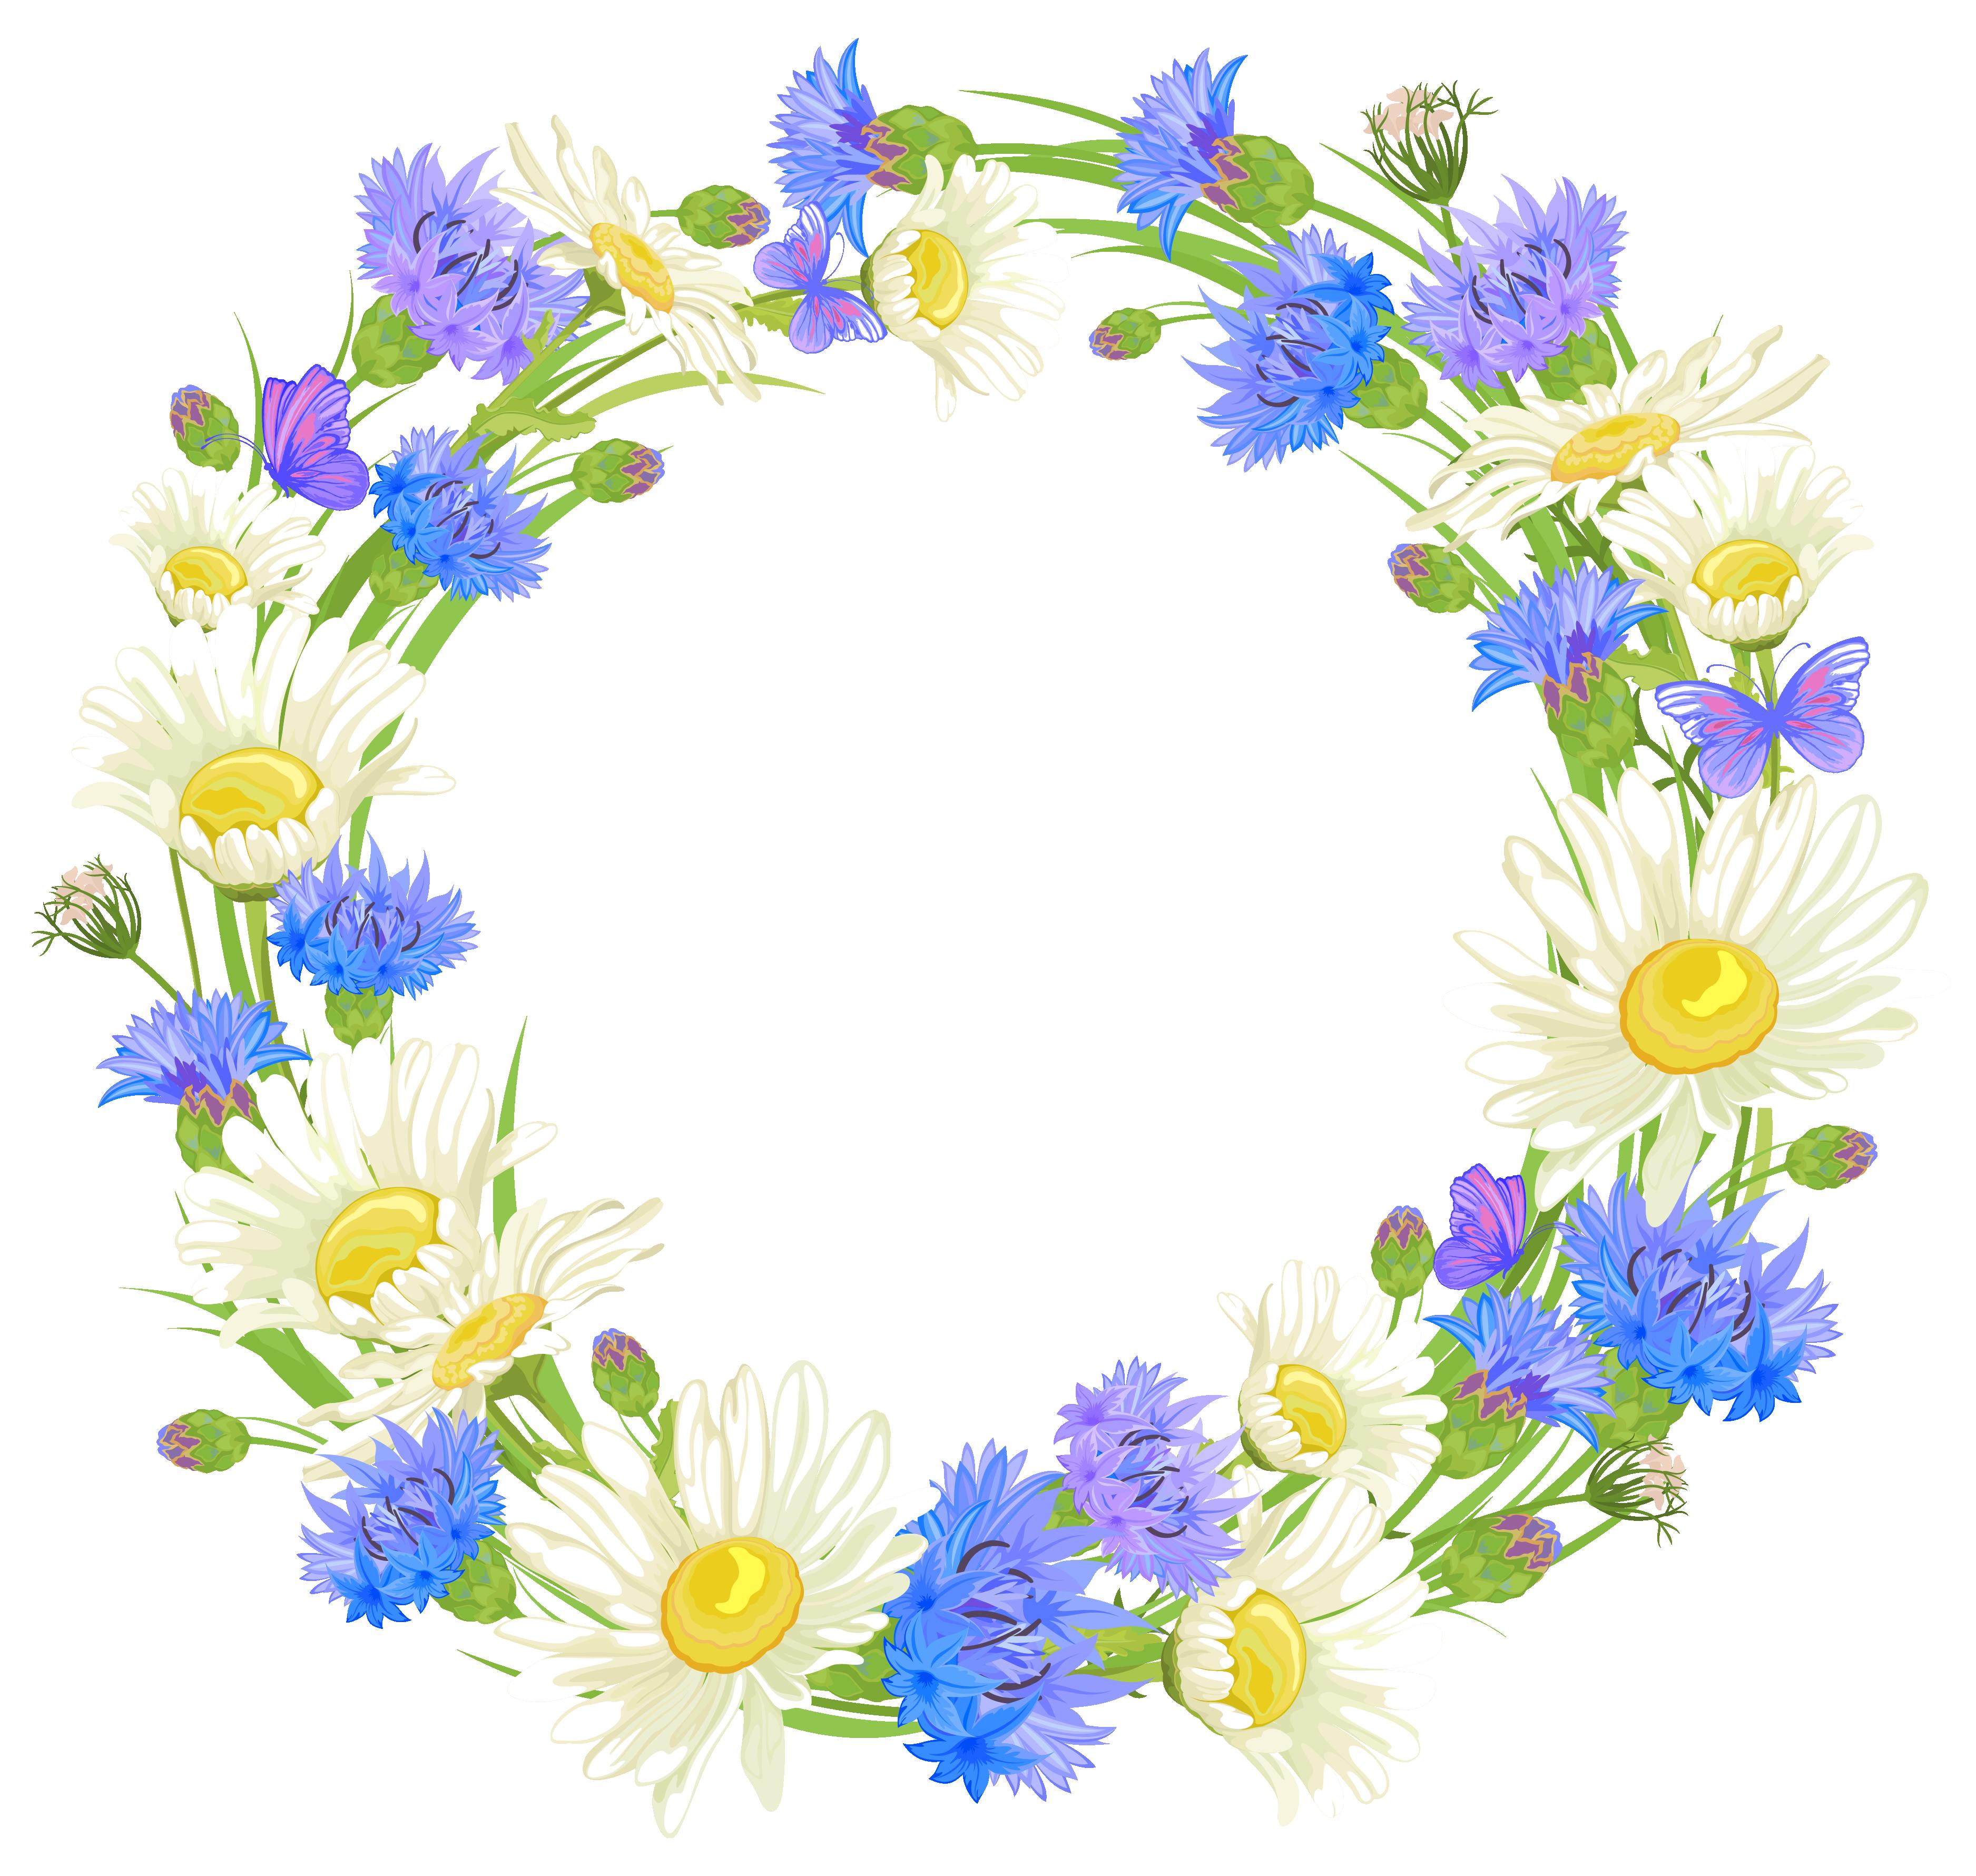 Field flowers wreath clipart 3751×3561 Backgrounds Pinterest